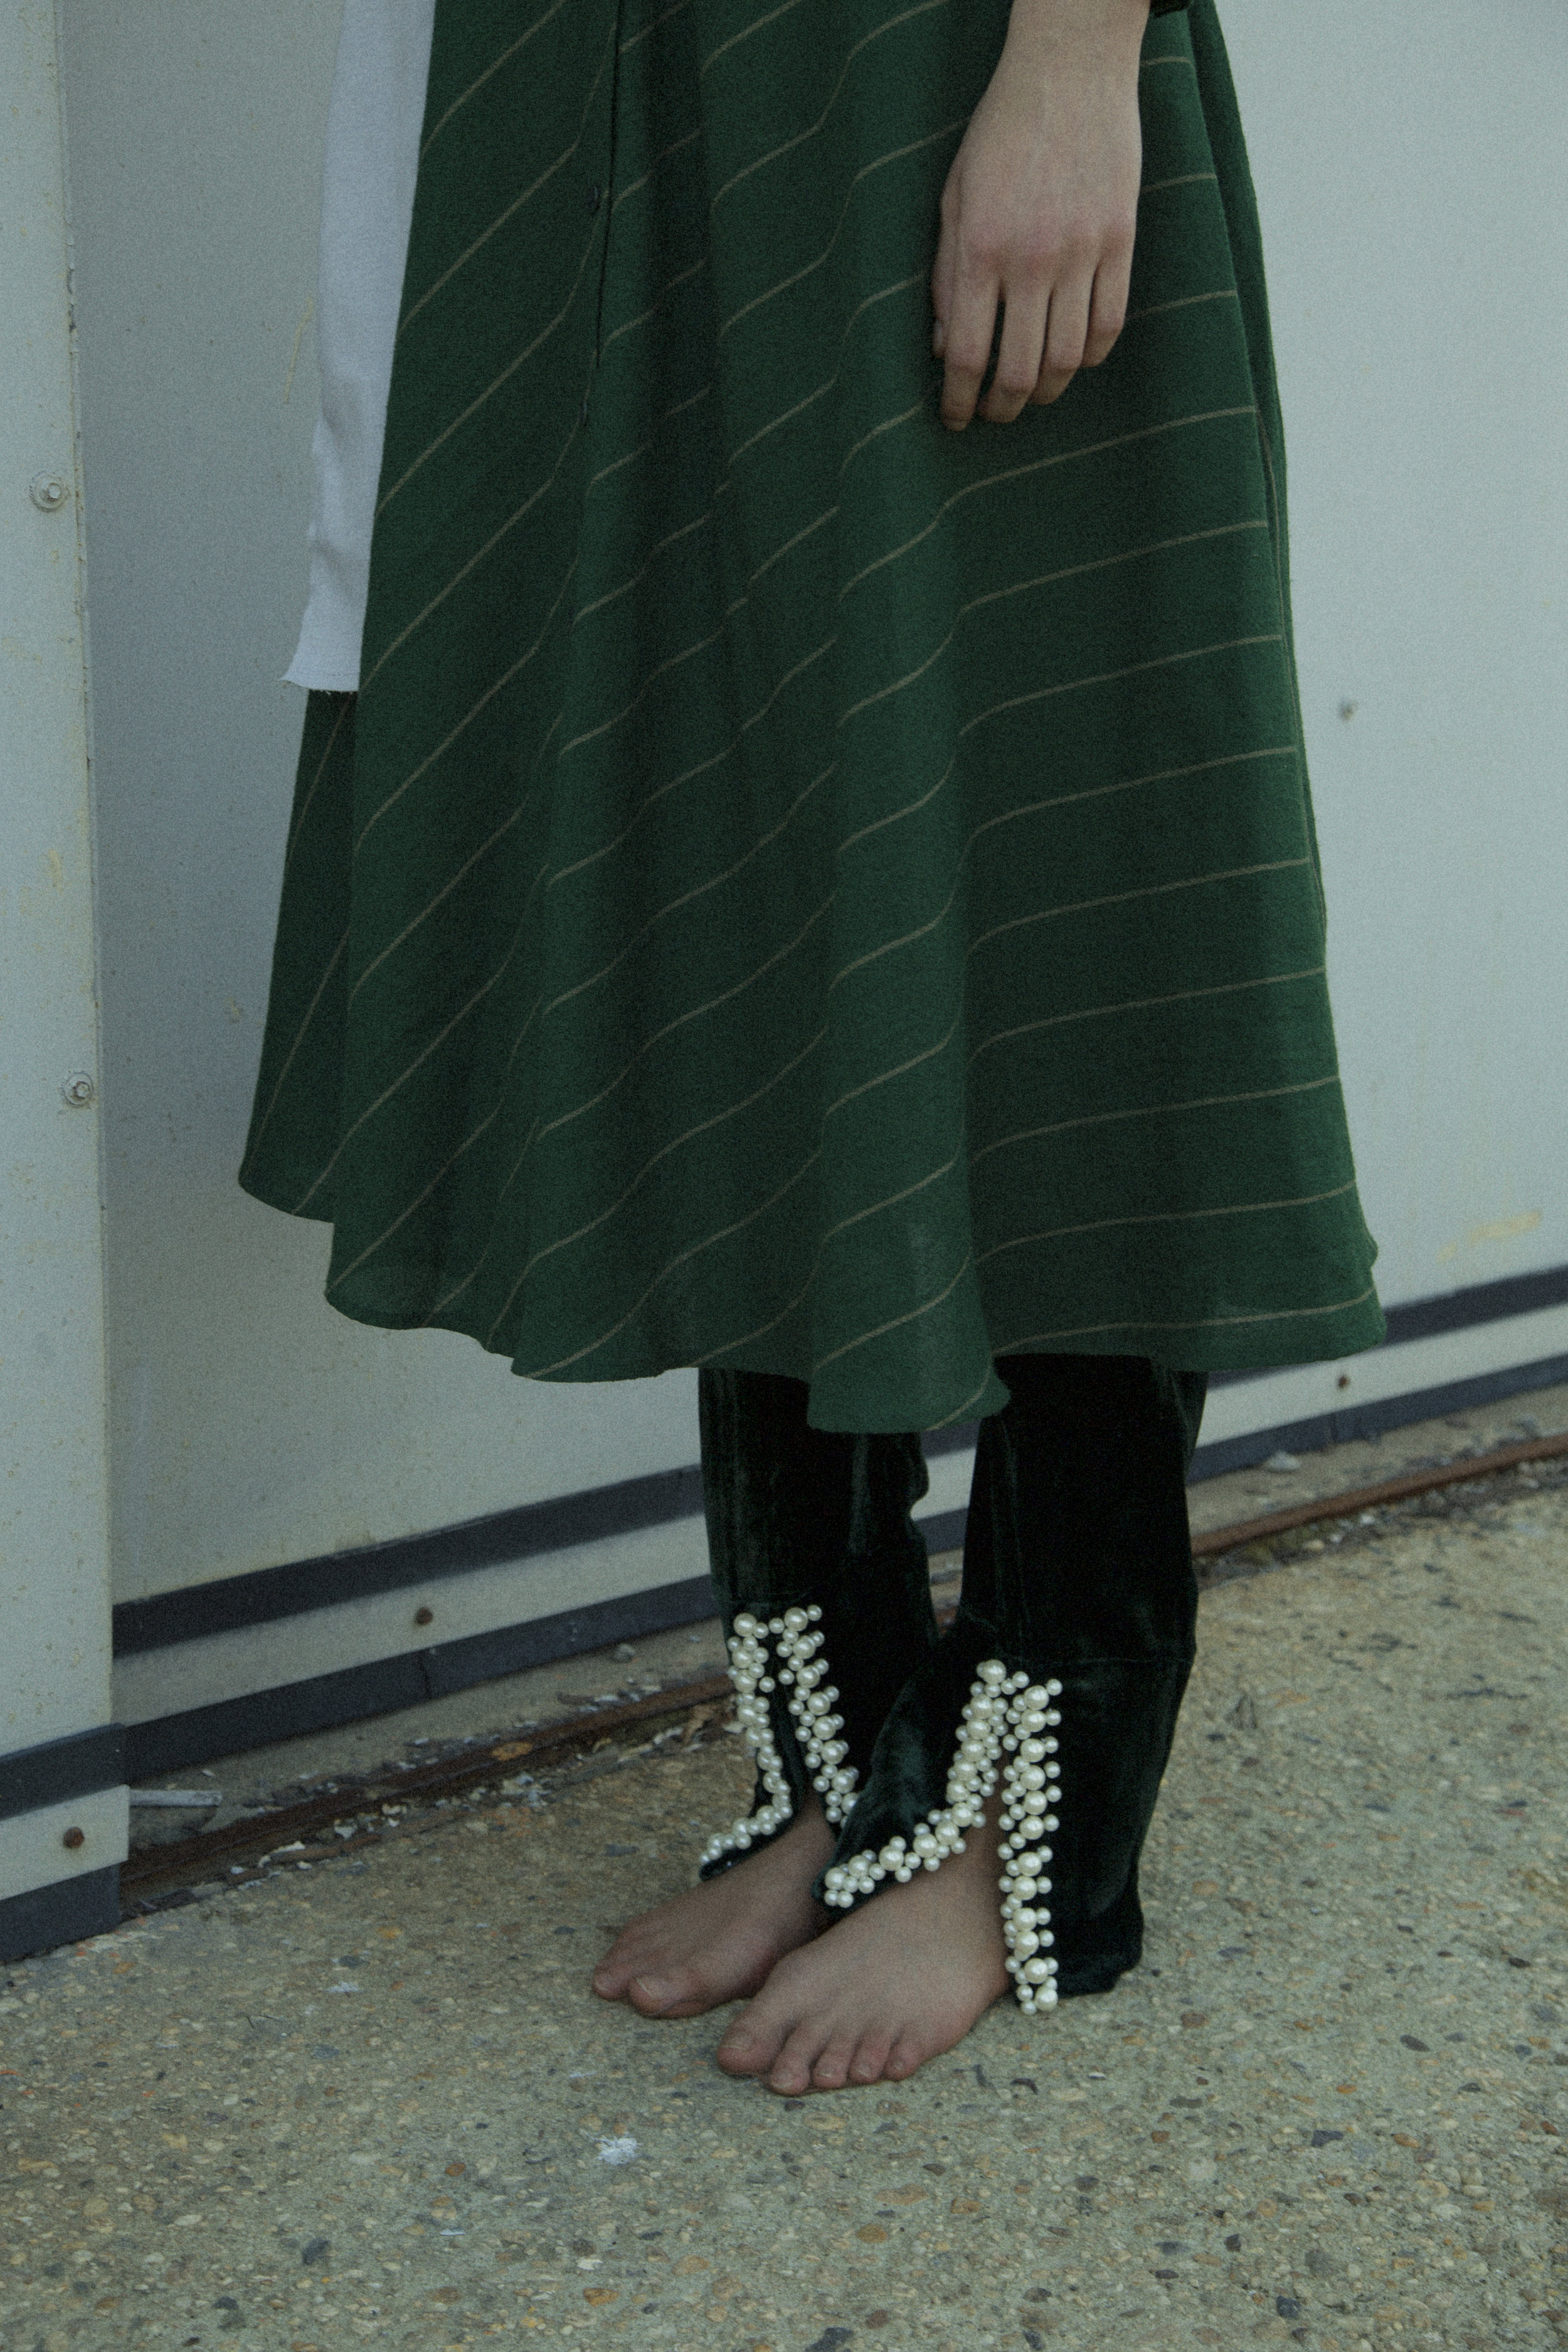 dress: samuji  jacket: carl jan cruz  bottoms: maki oh